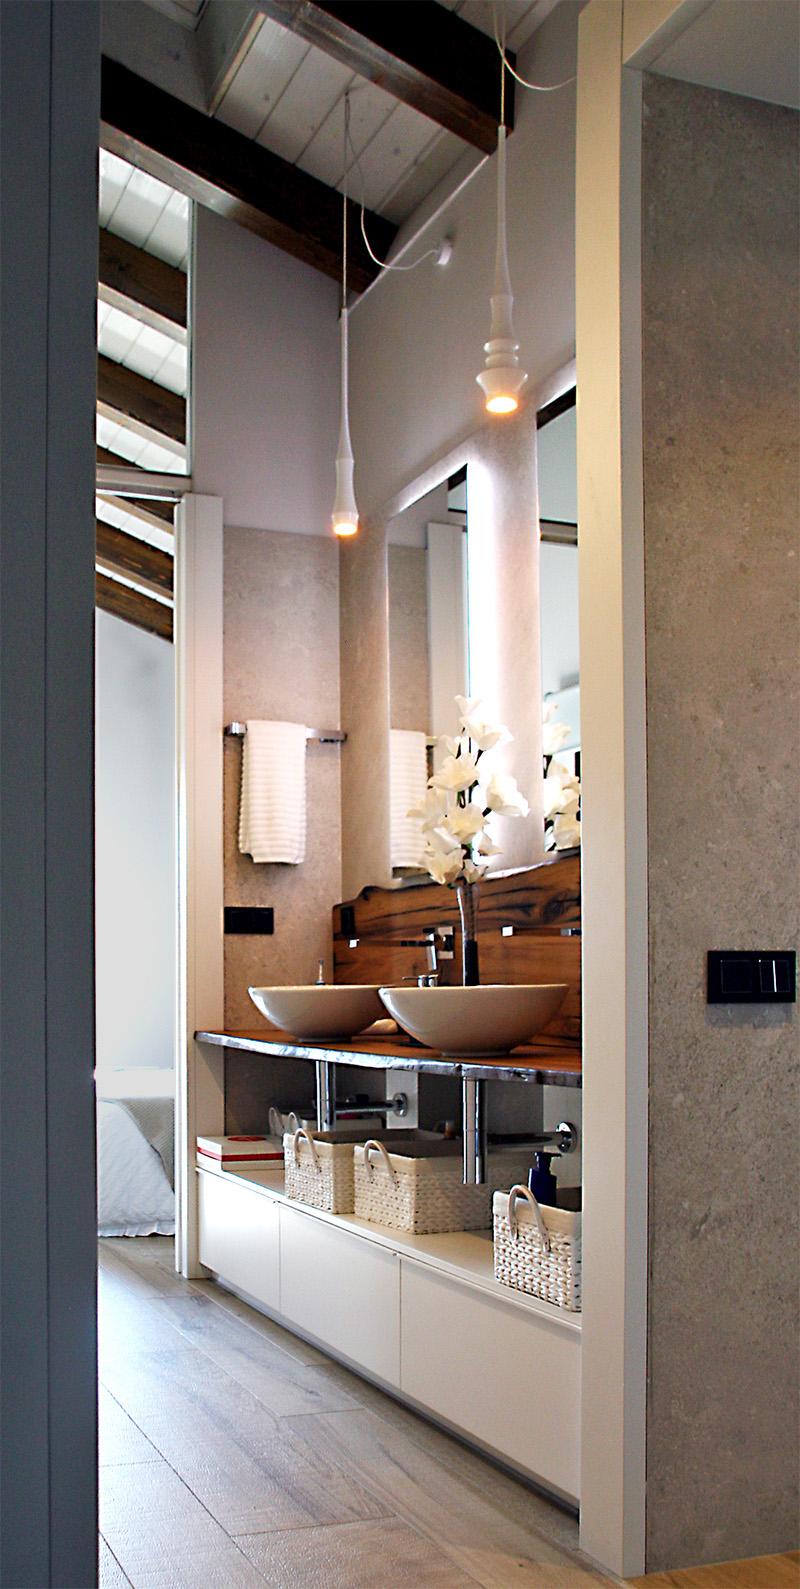 Aitec proyectos ingenier a y arquitectura vivienda en for Arquitectura de interiores pdf